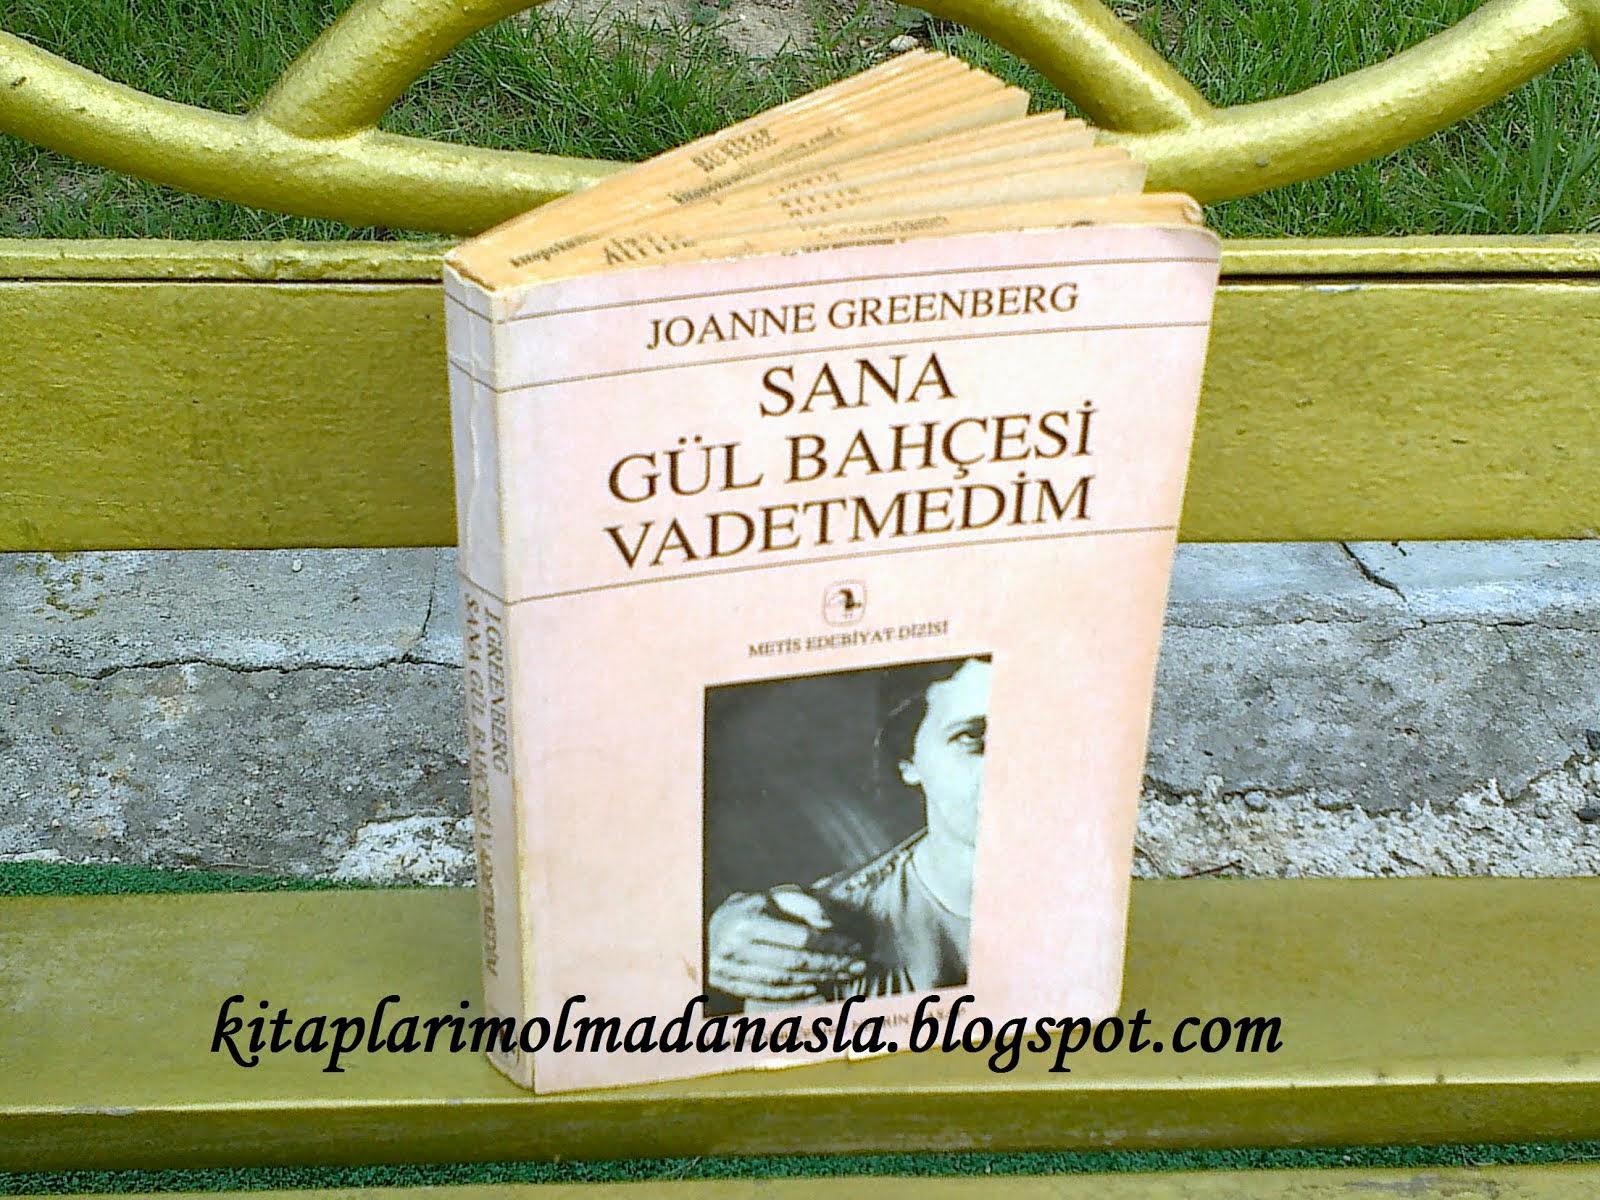 JOANNE GREENBERG - SANA GÜL BAHÇESİ VADETMEDİM